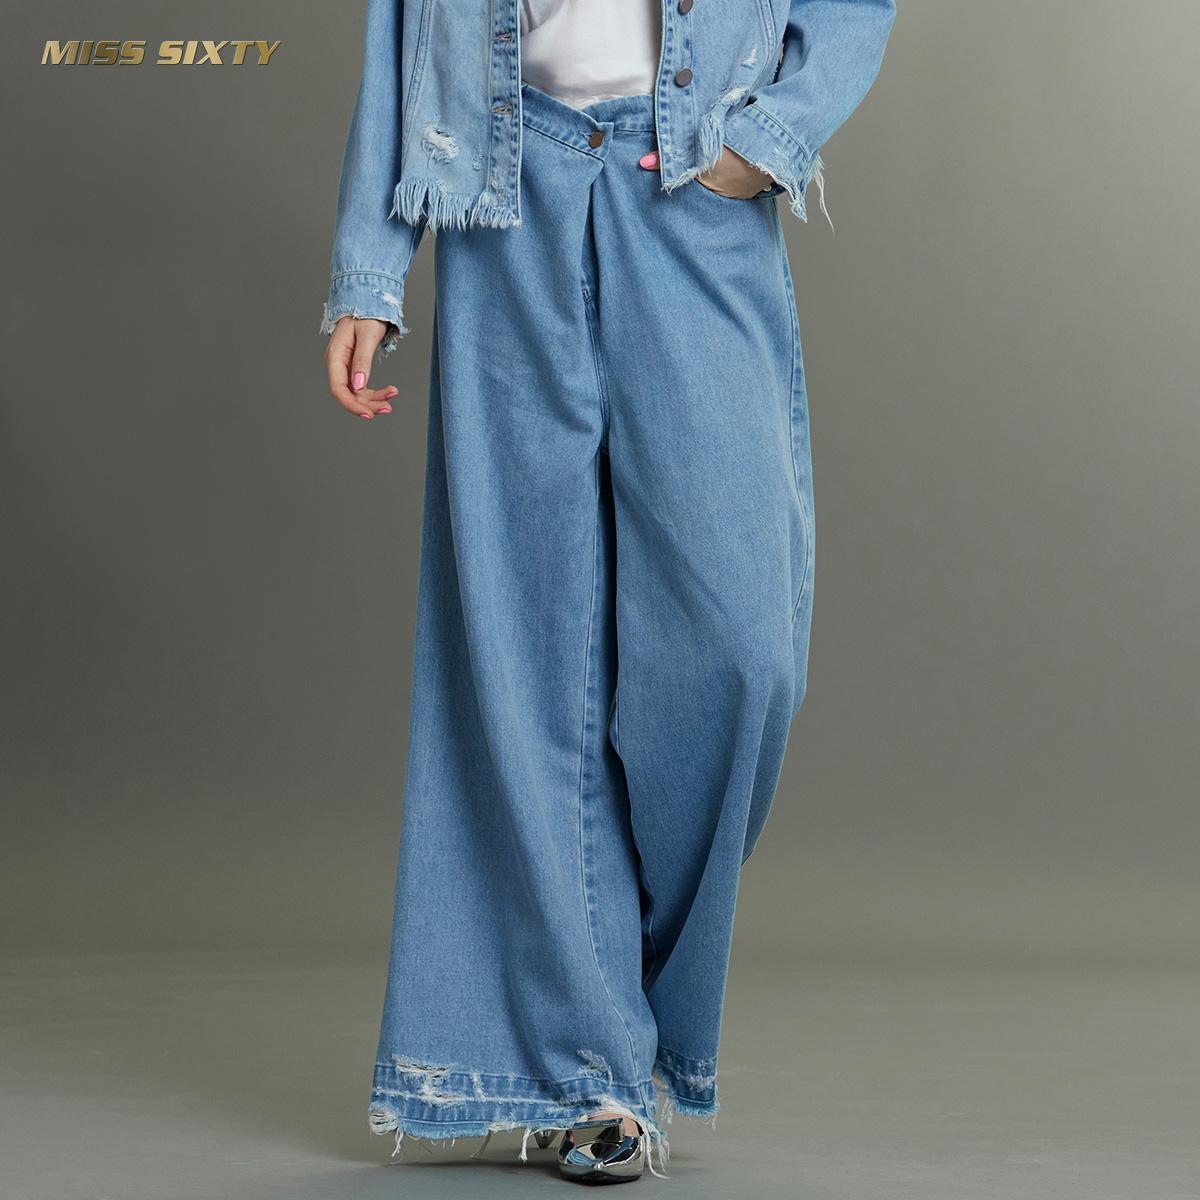 C Miss Sixty秋季中腰纯棉直筒裤阔腿裤长裤毛边牛仔裤女宽松